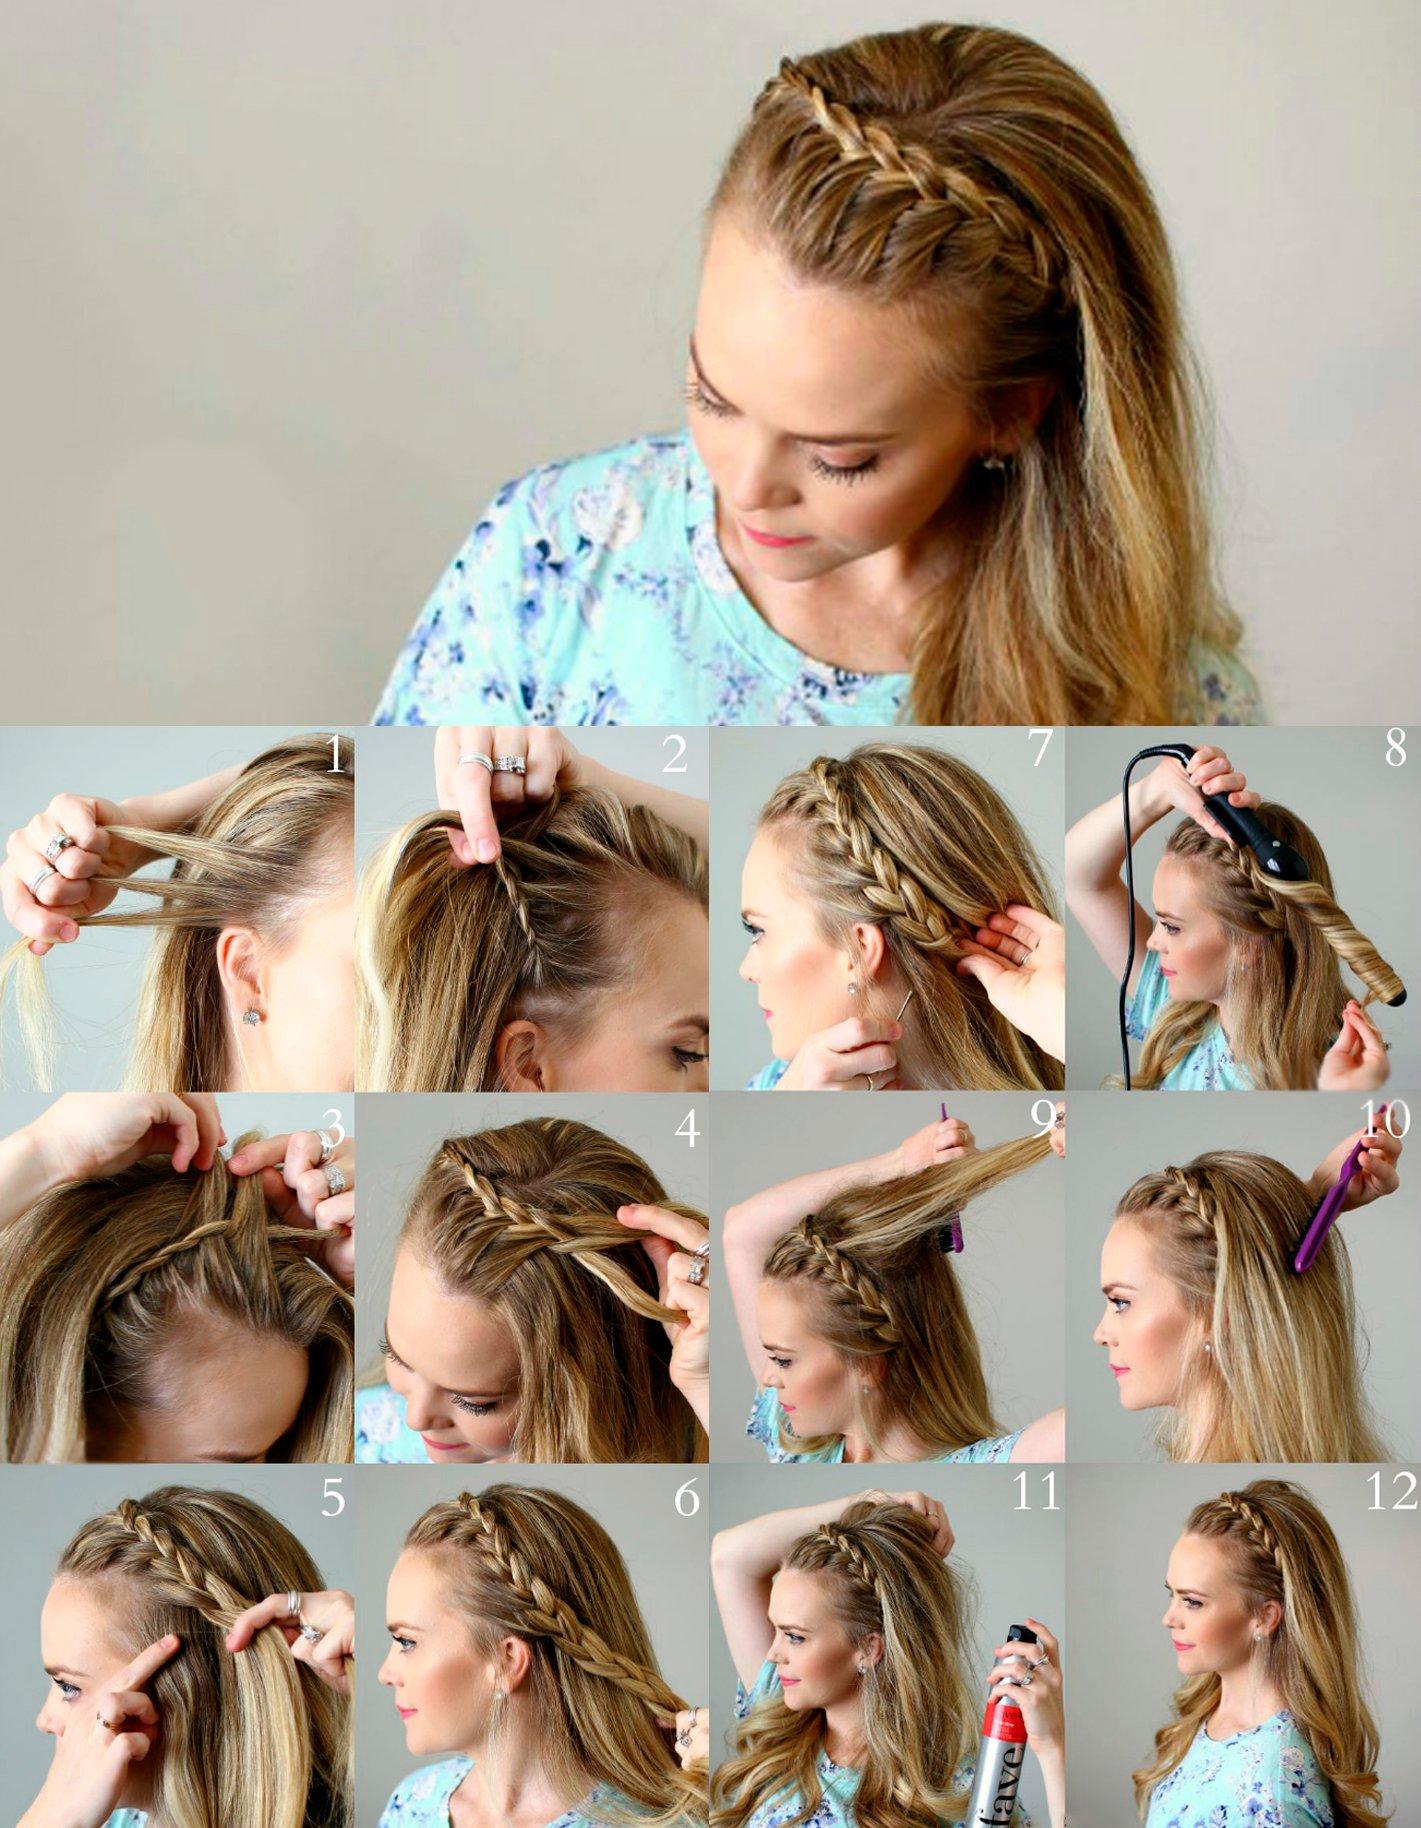 15 Tipos De Peinados Con Trenzas Que Te Encantaran - Peinados-con-tranzas